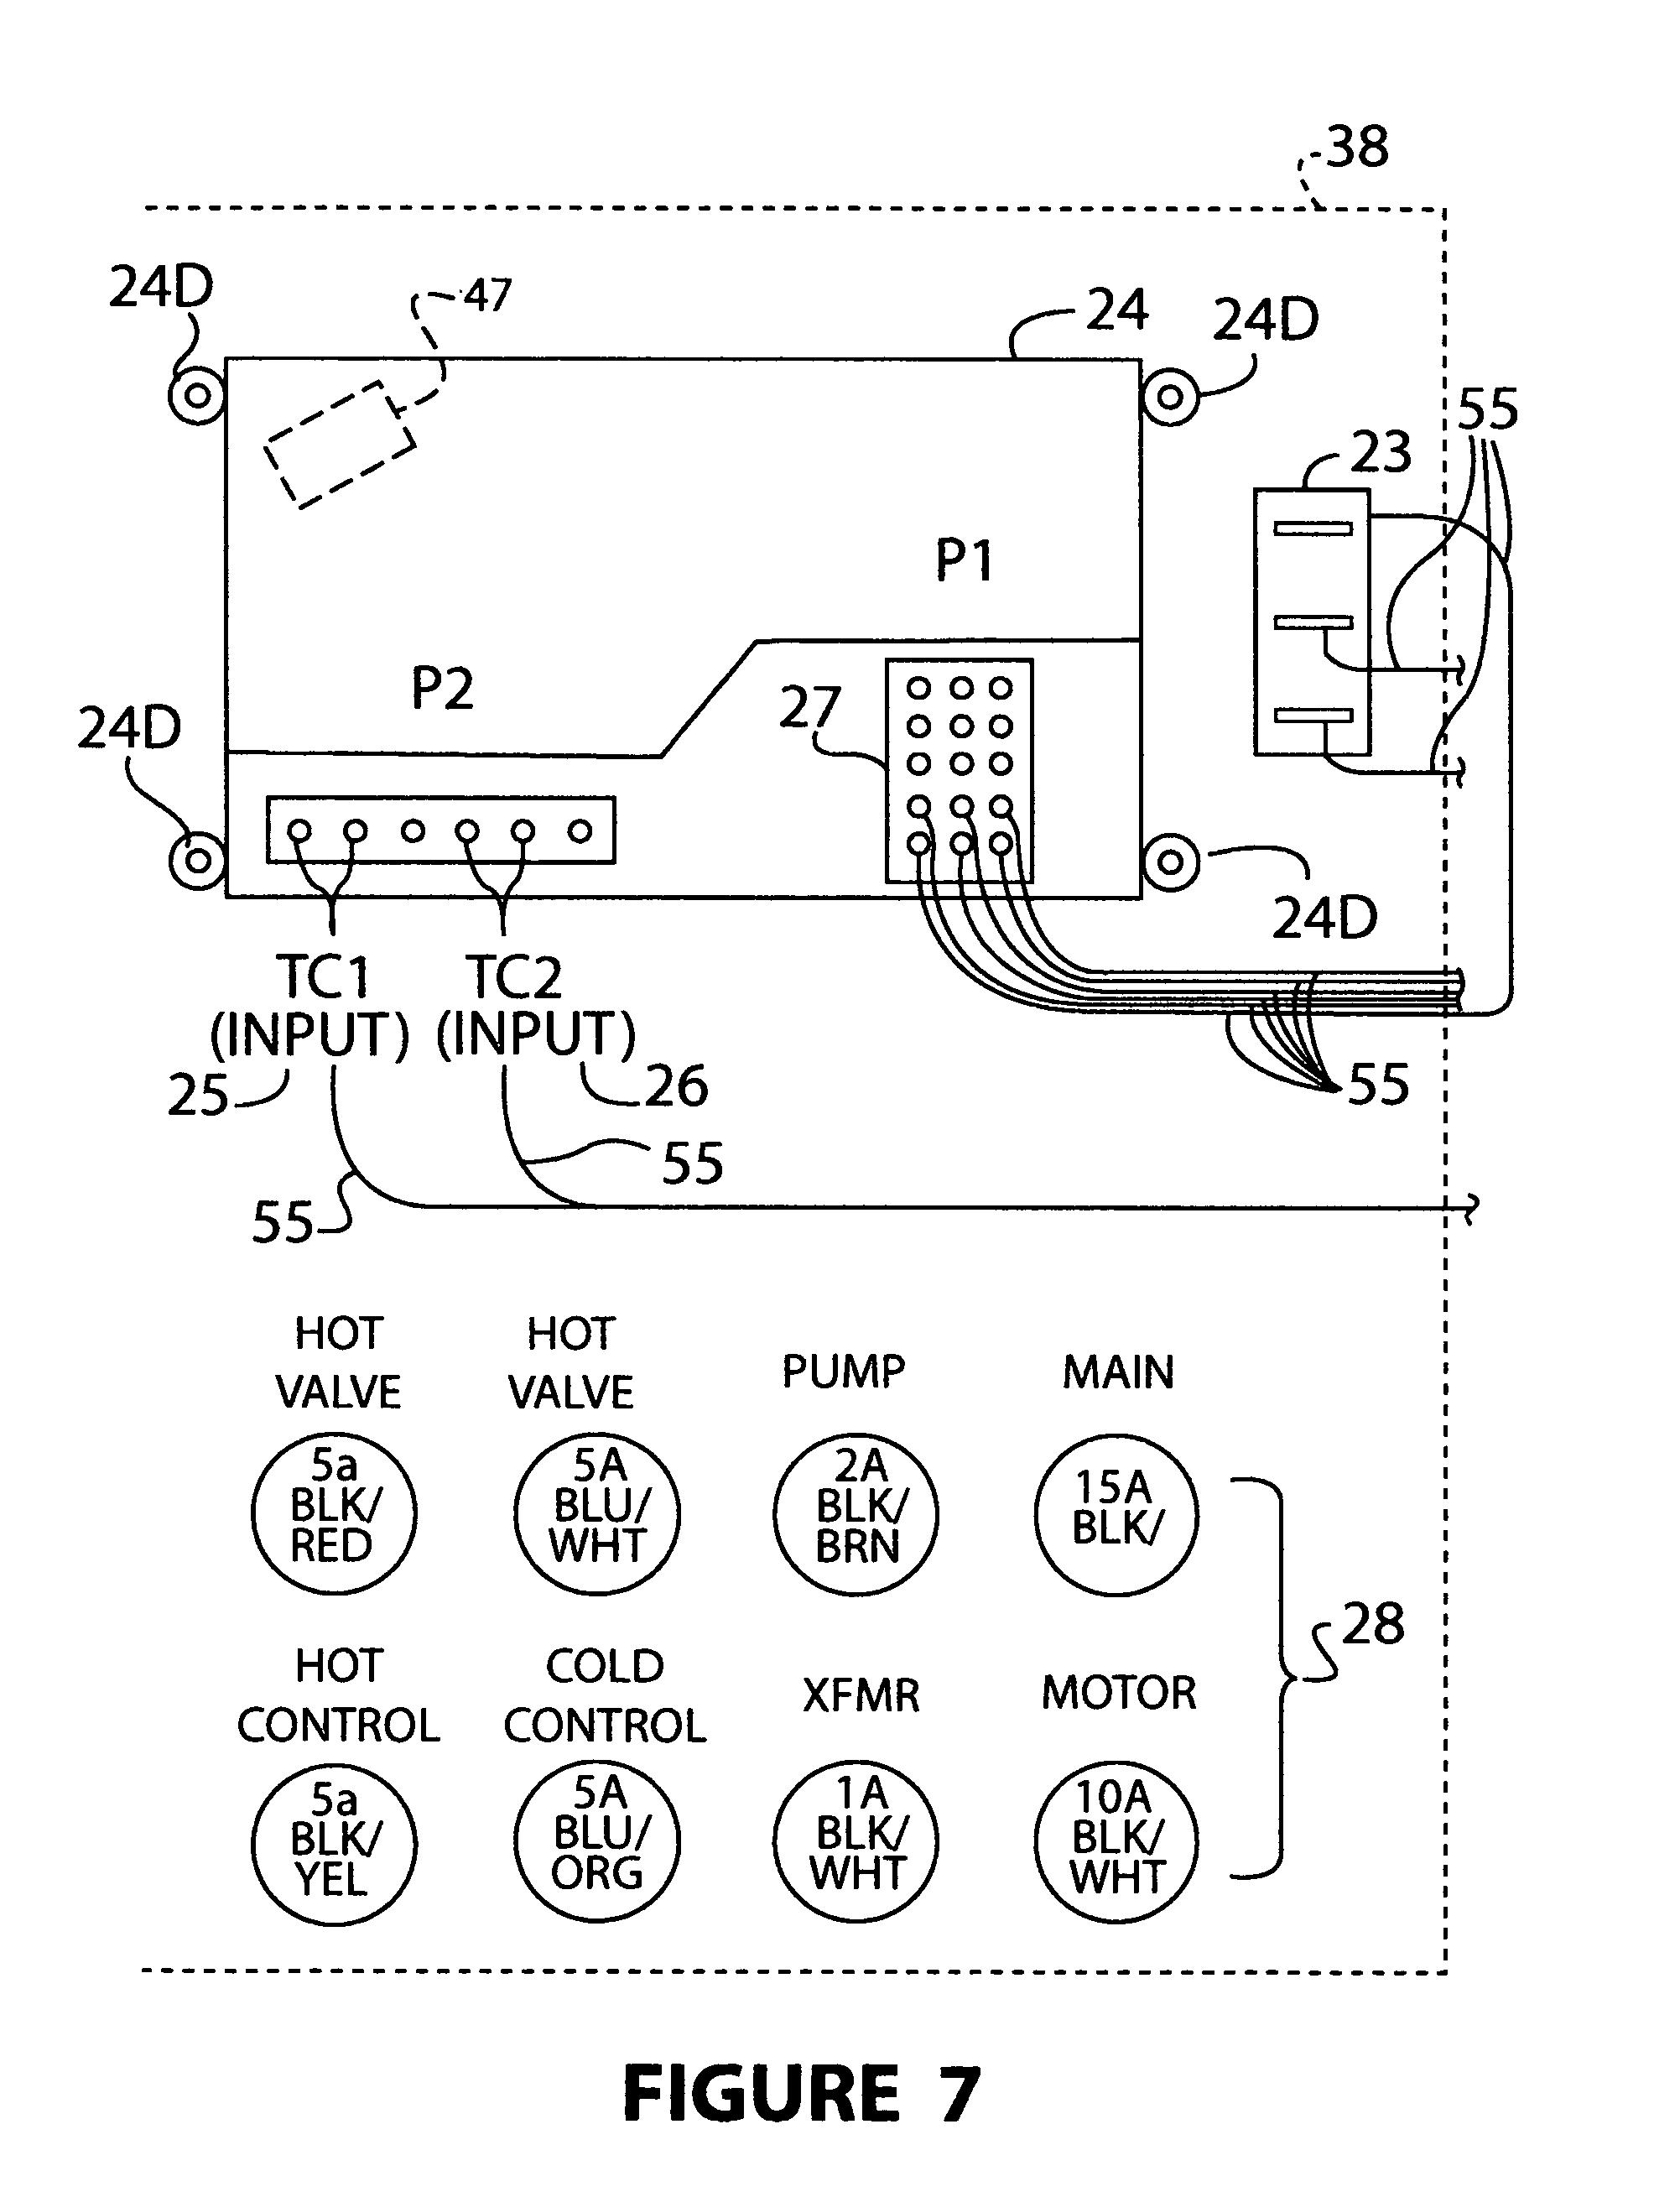 Water Heater Upper Thermostat Wiring Diagram, Water, Get